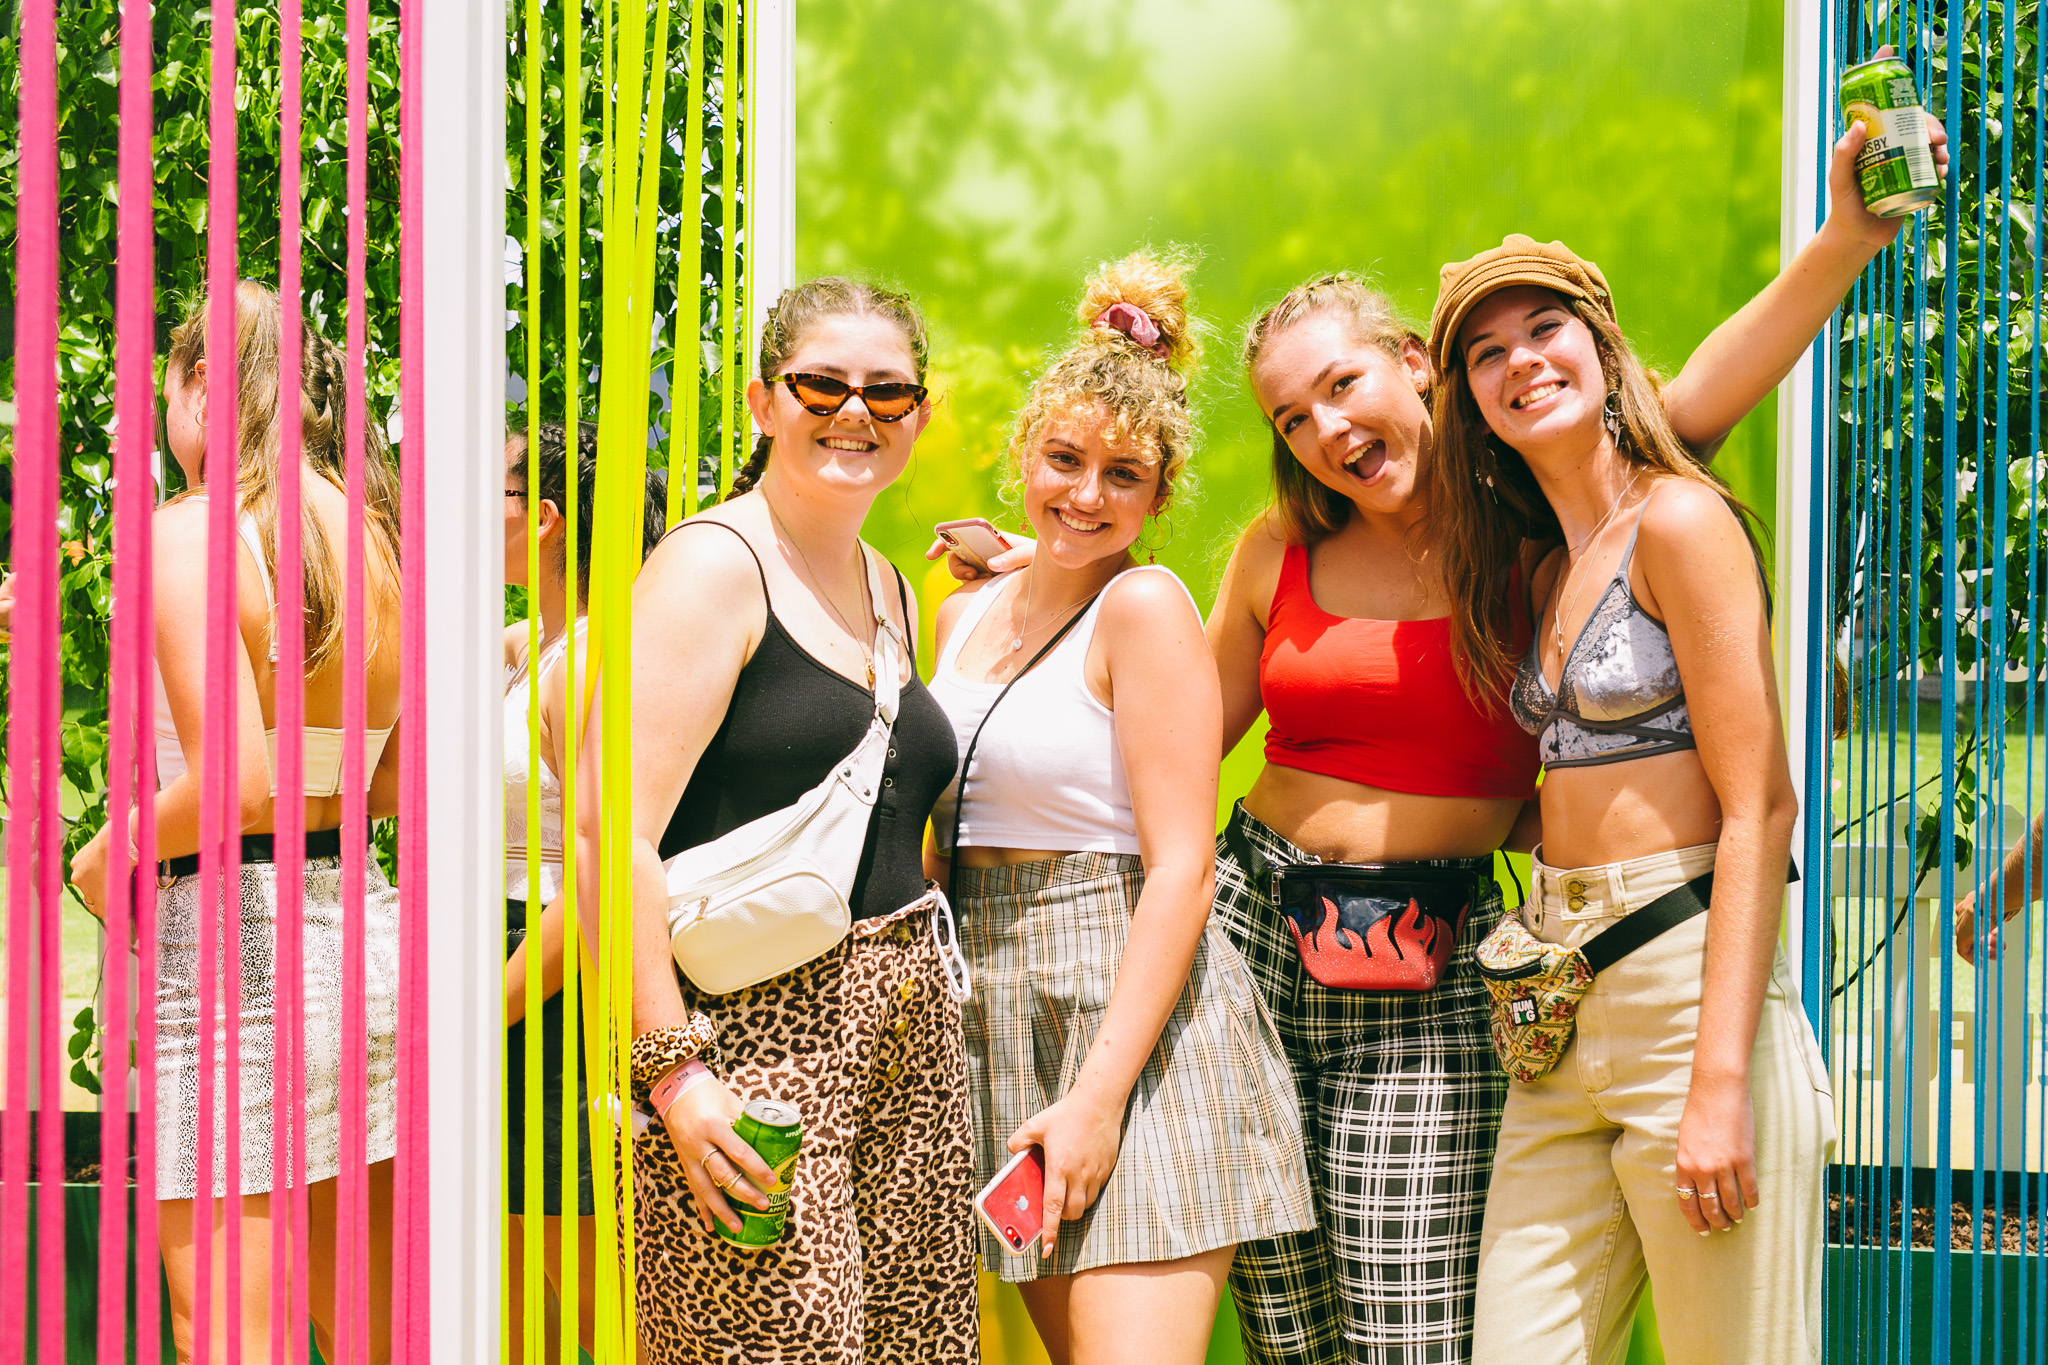 Sponsors - Somersby_Laneway Brisbane 2019_Bianca Holderness-2.jpg